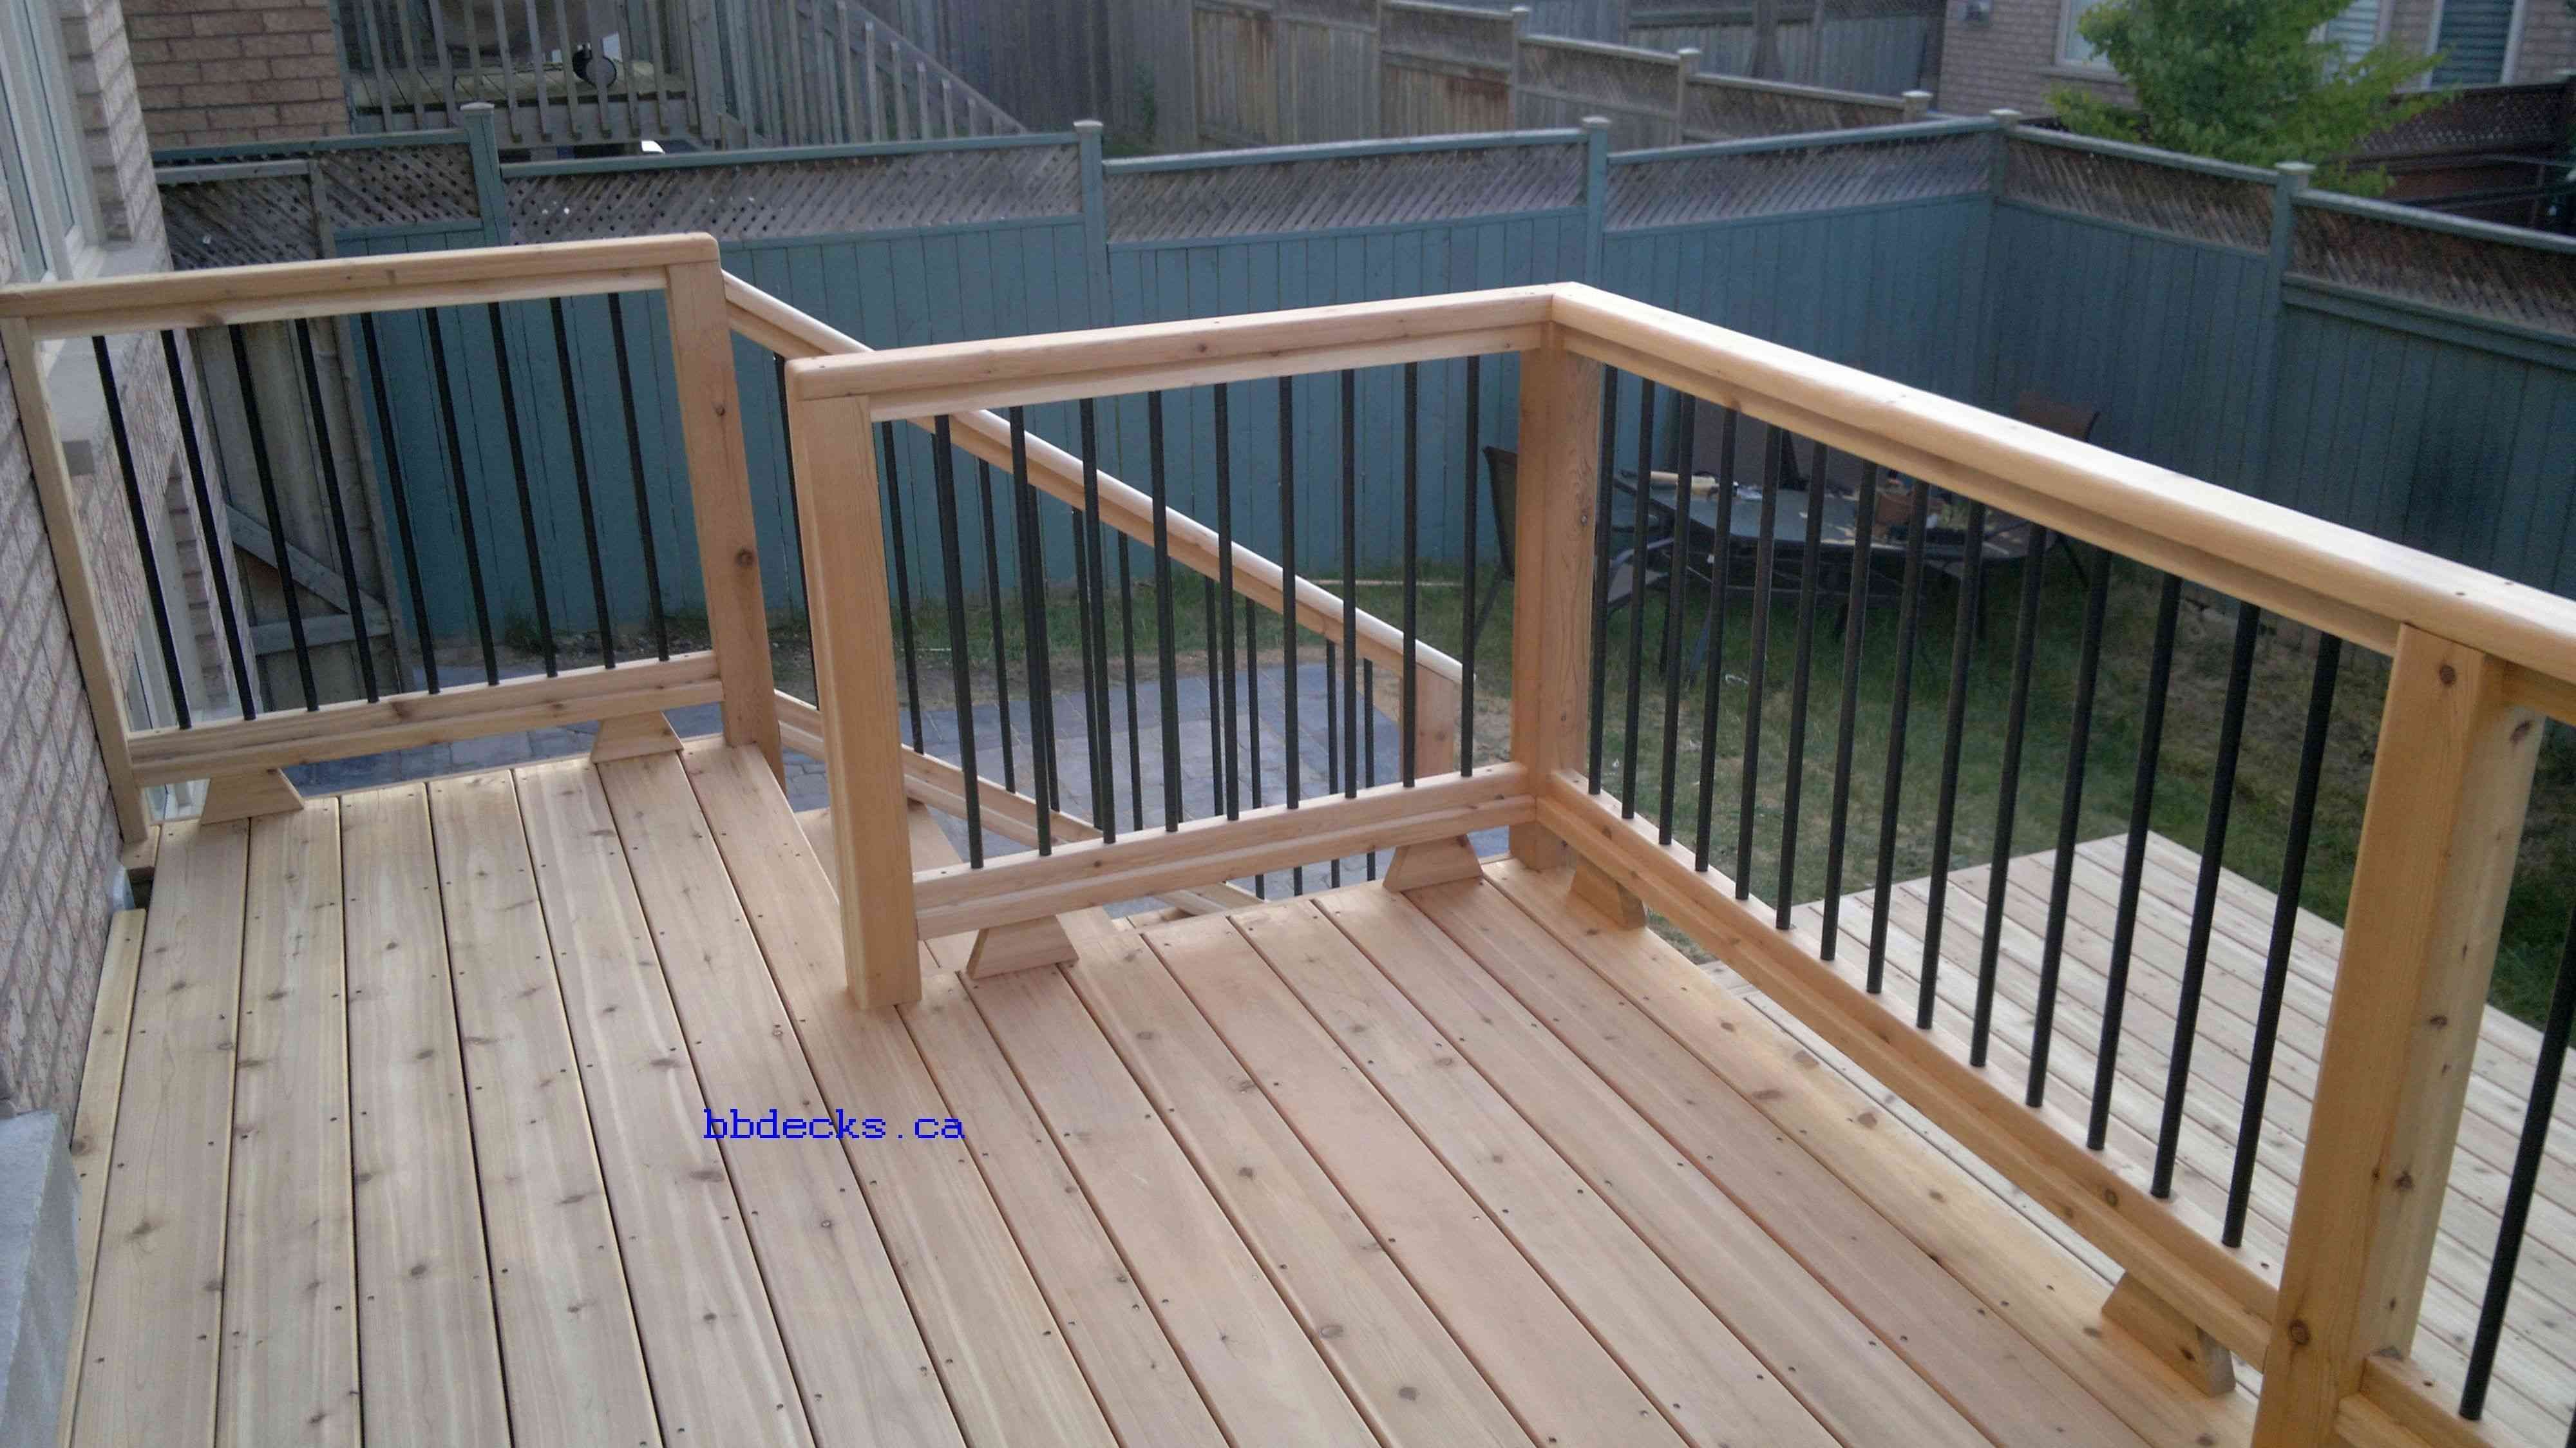 32 Diy Deck Railing Ideas Designs That Are Sure To Inspire You Diy Deck Porch Design Porch Railing